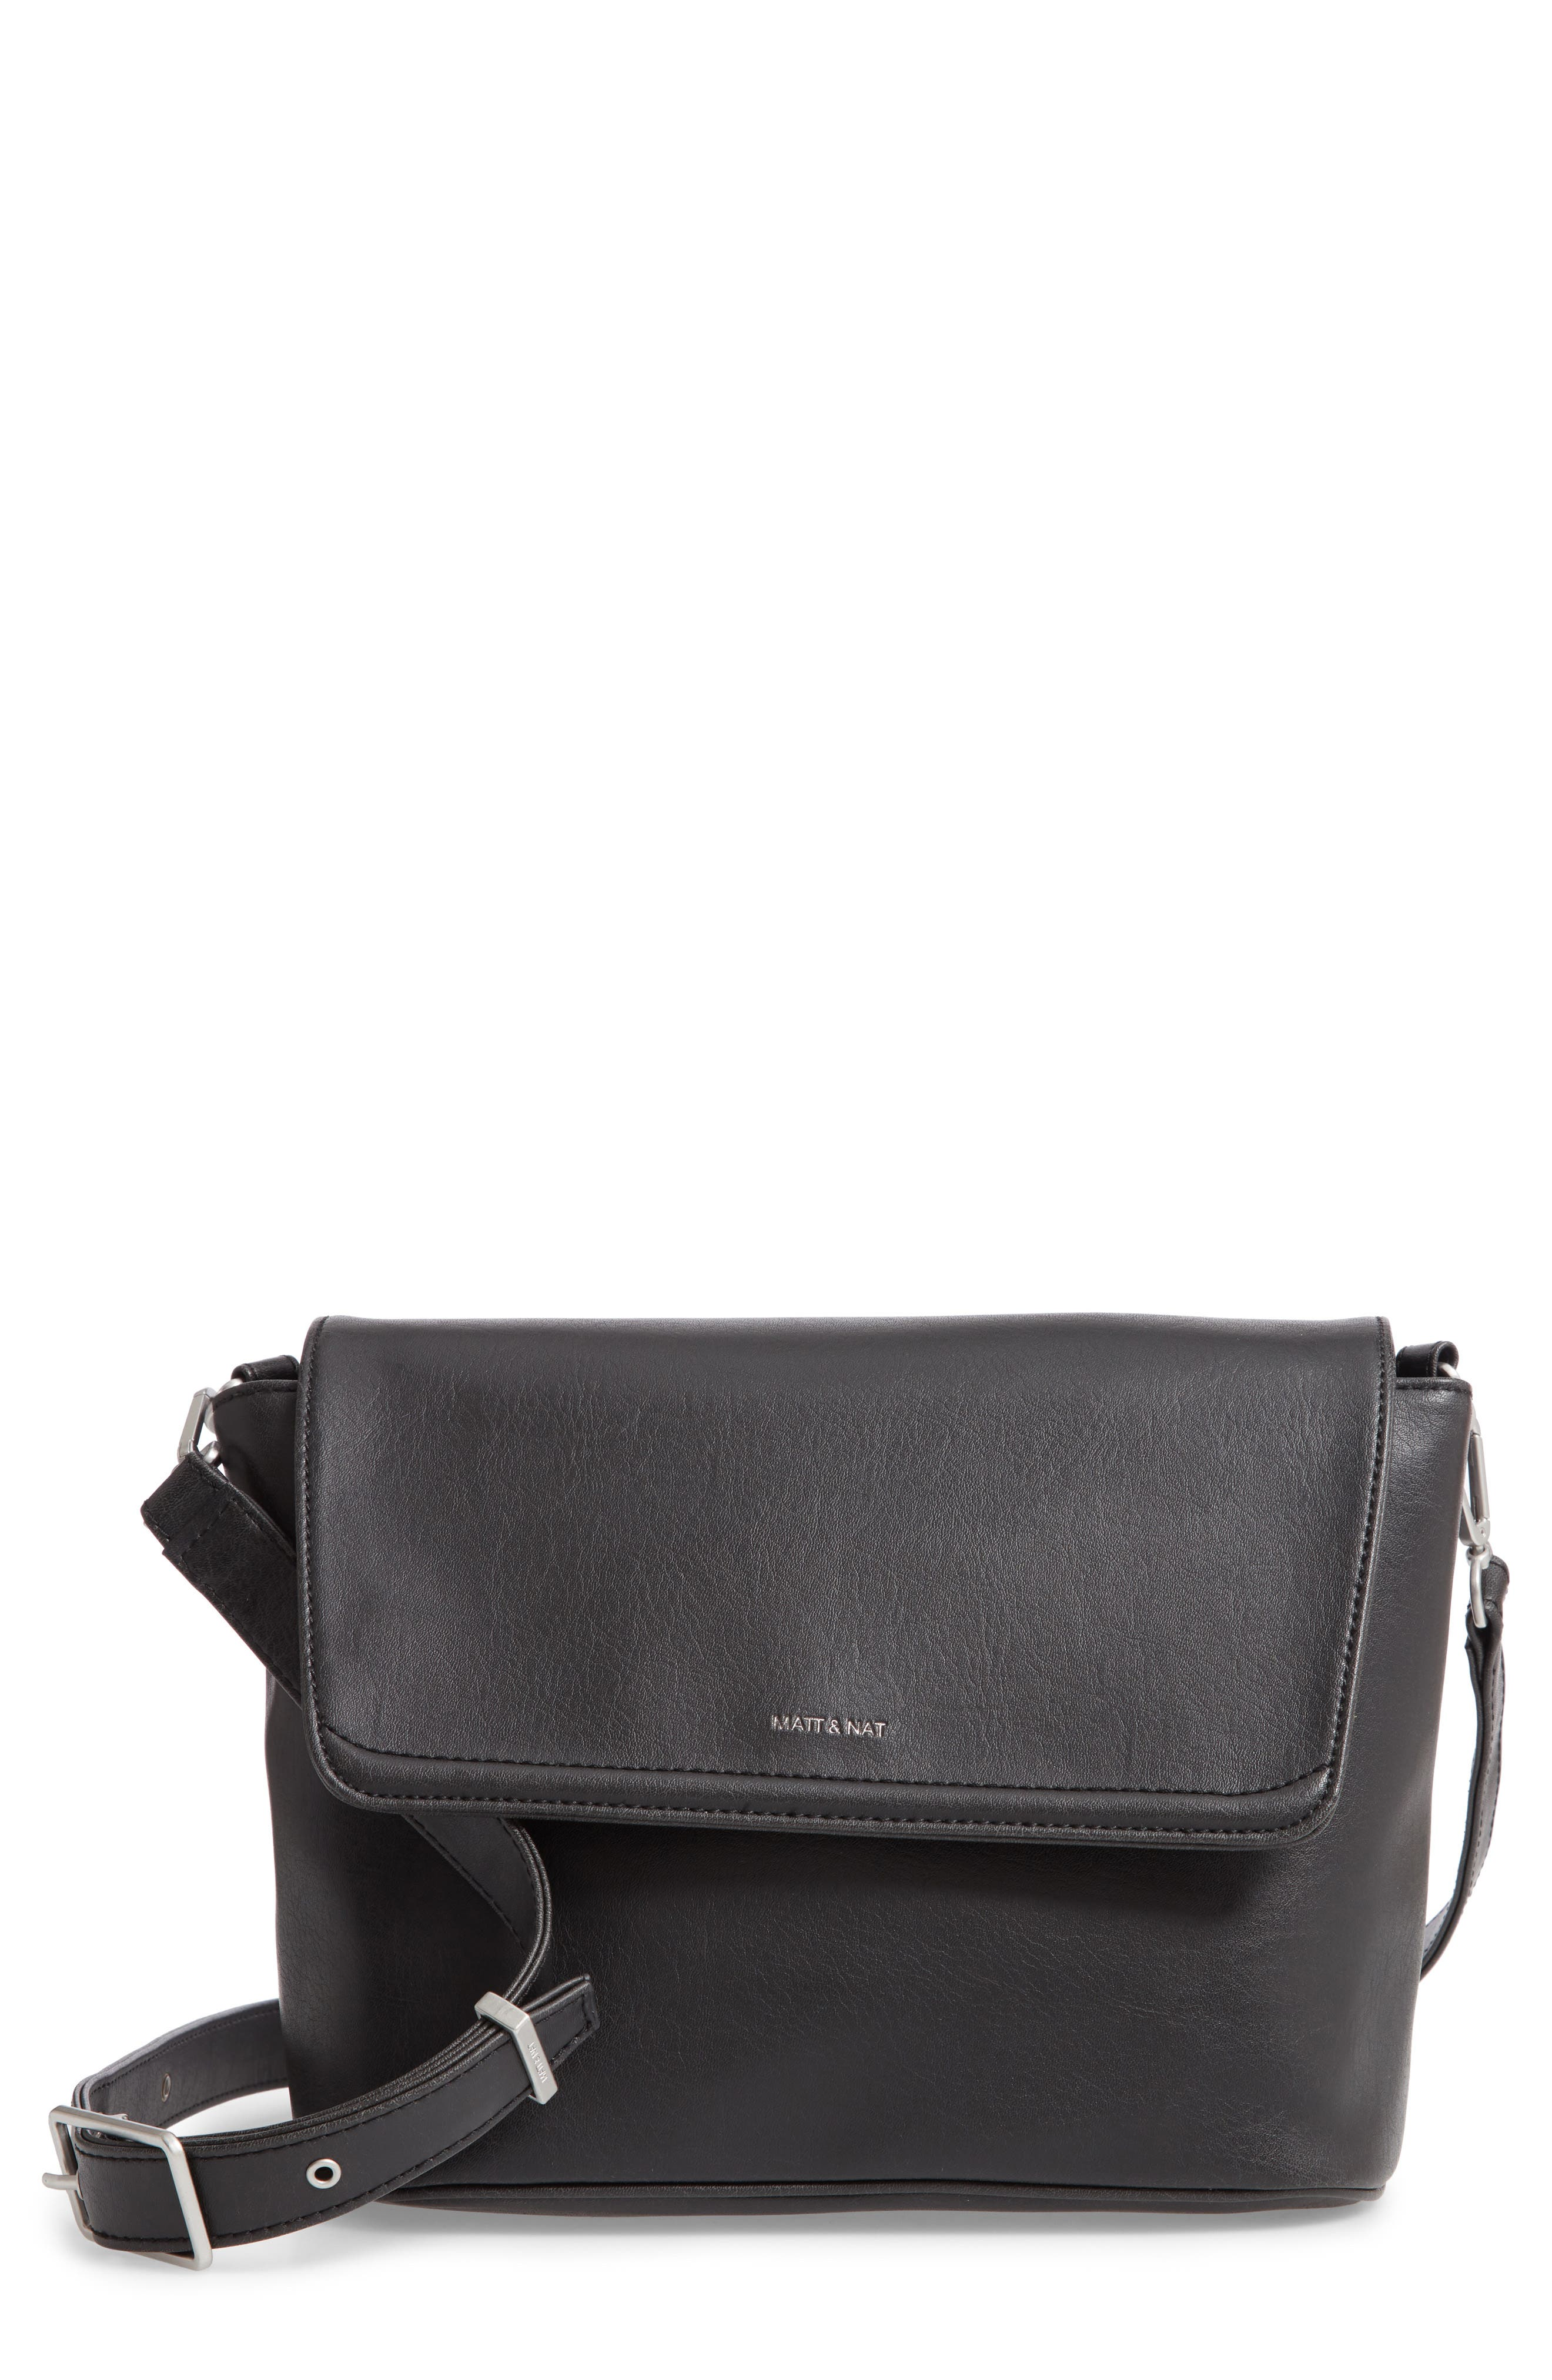 Matt & Nat Reiti Faux Leather Crossbody Bag - Black